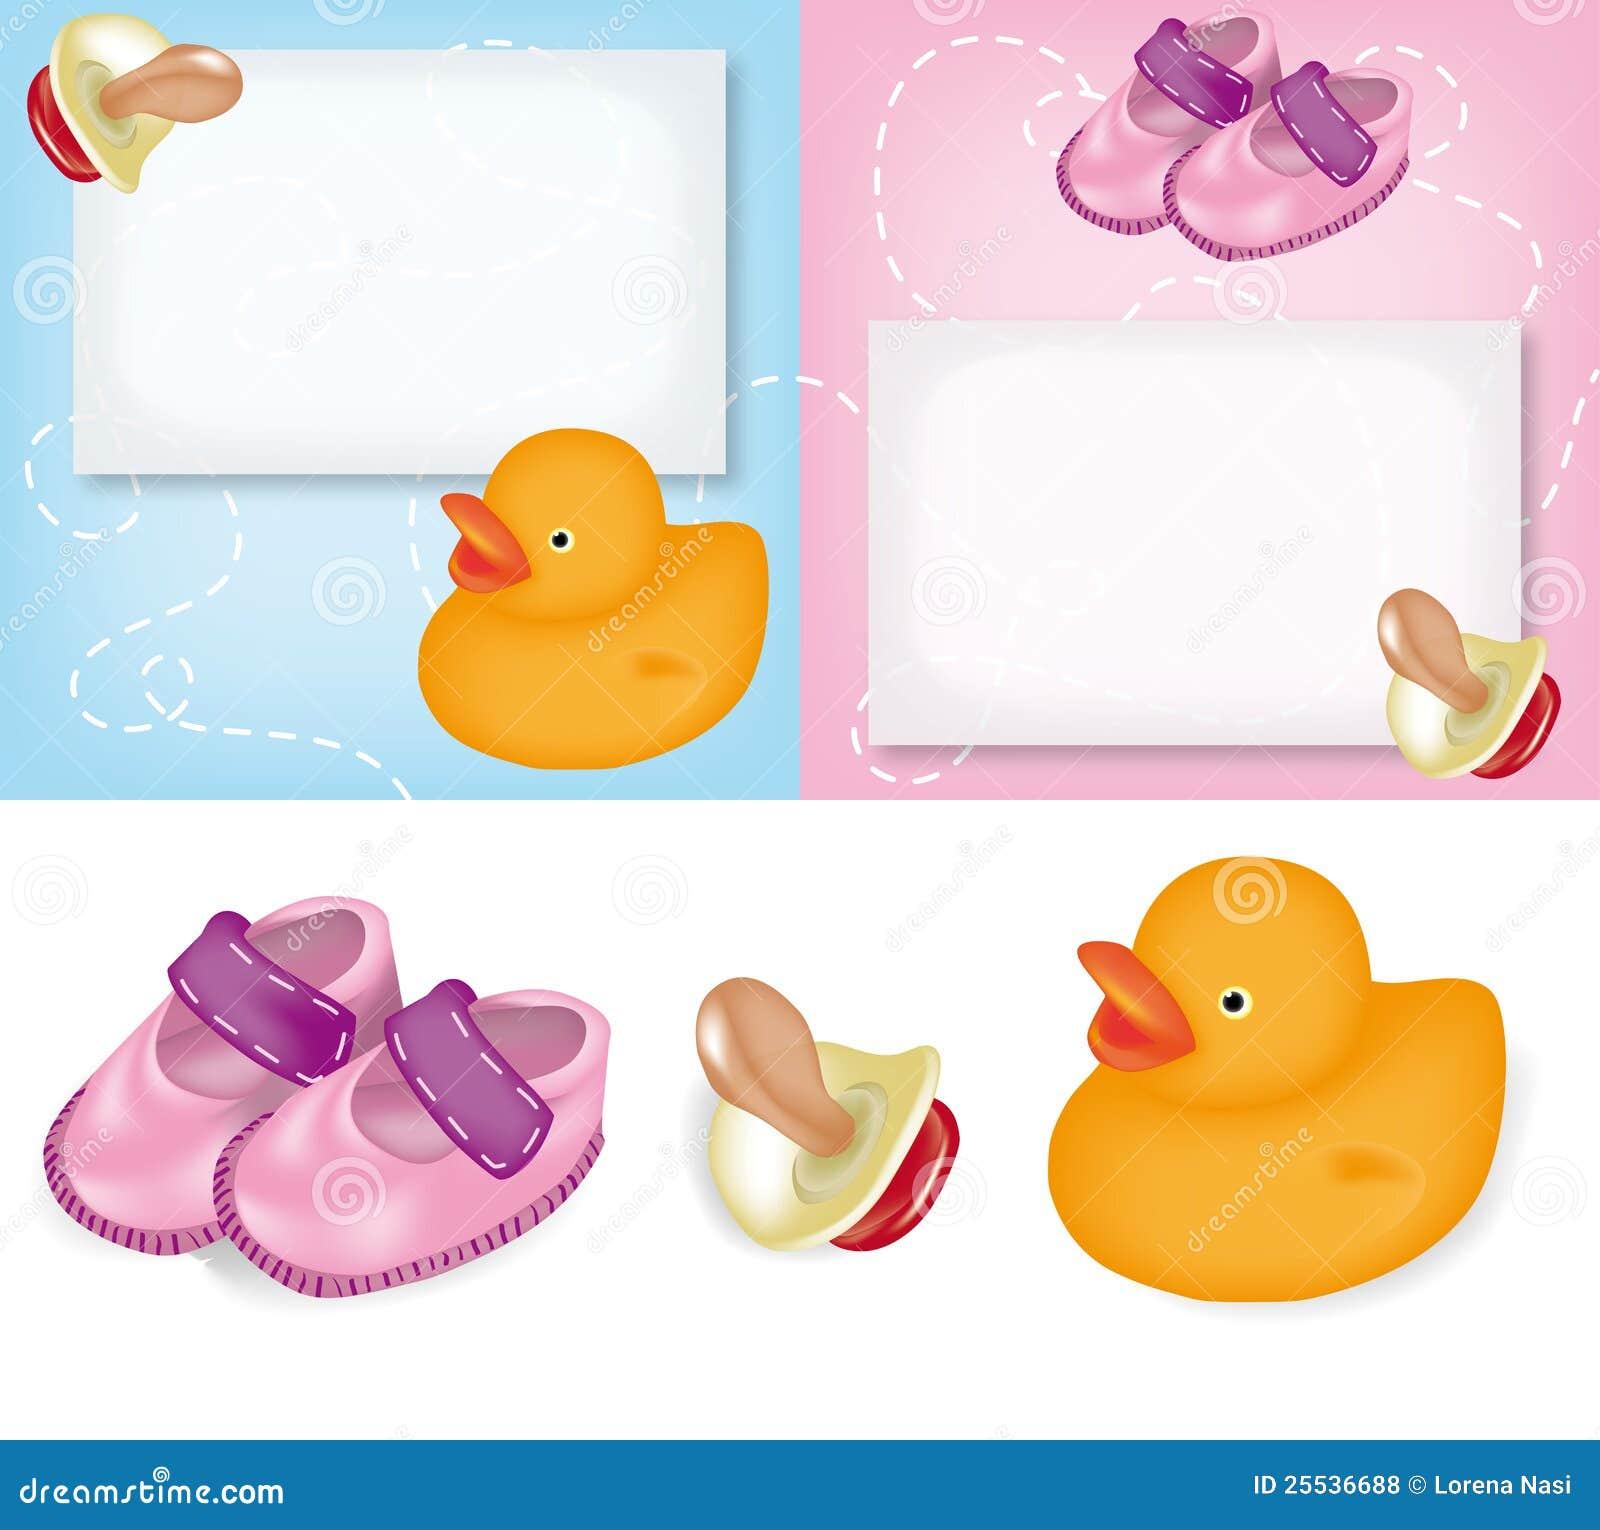 Auguri Matrimonio E Nascita : Cartoline d auguri per la nascita fotografie stock libere